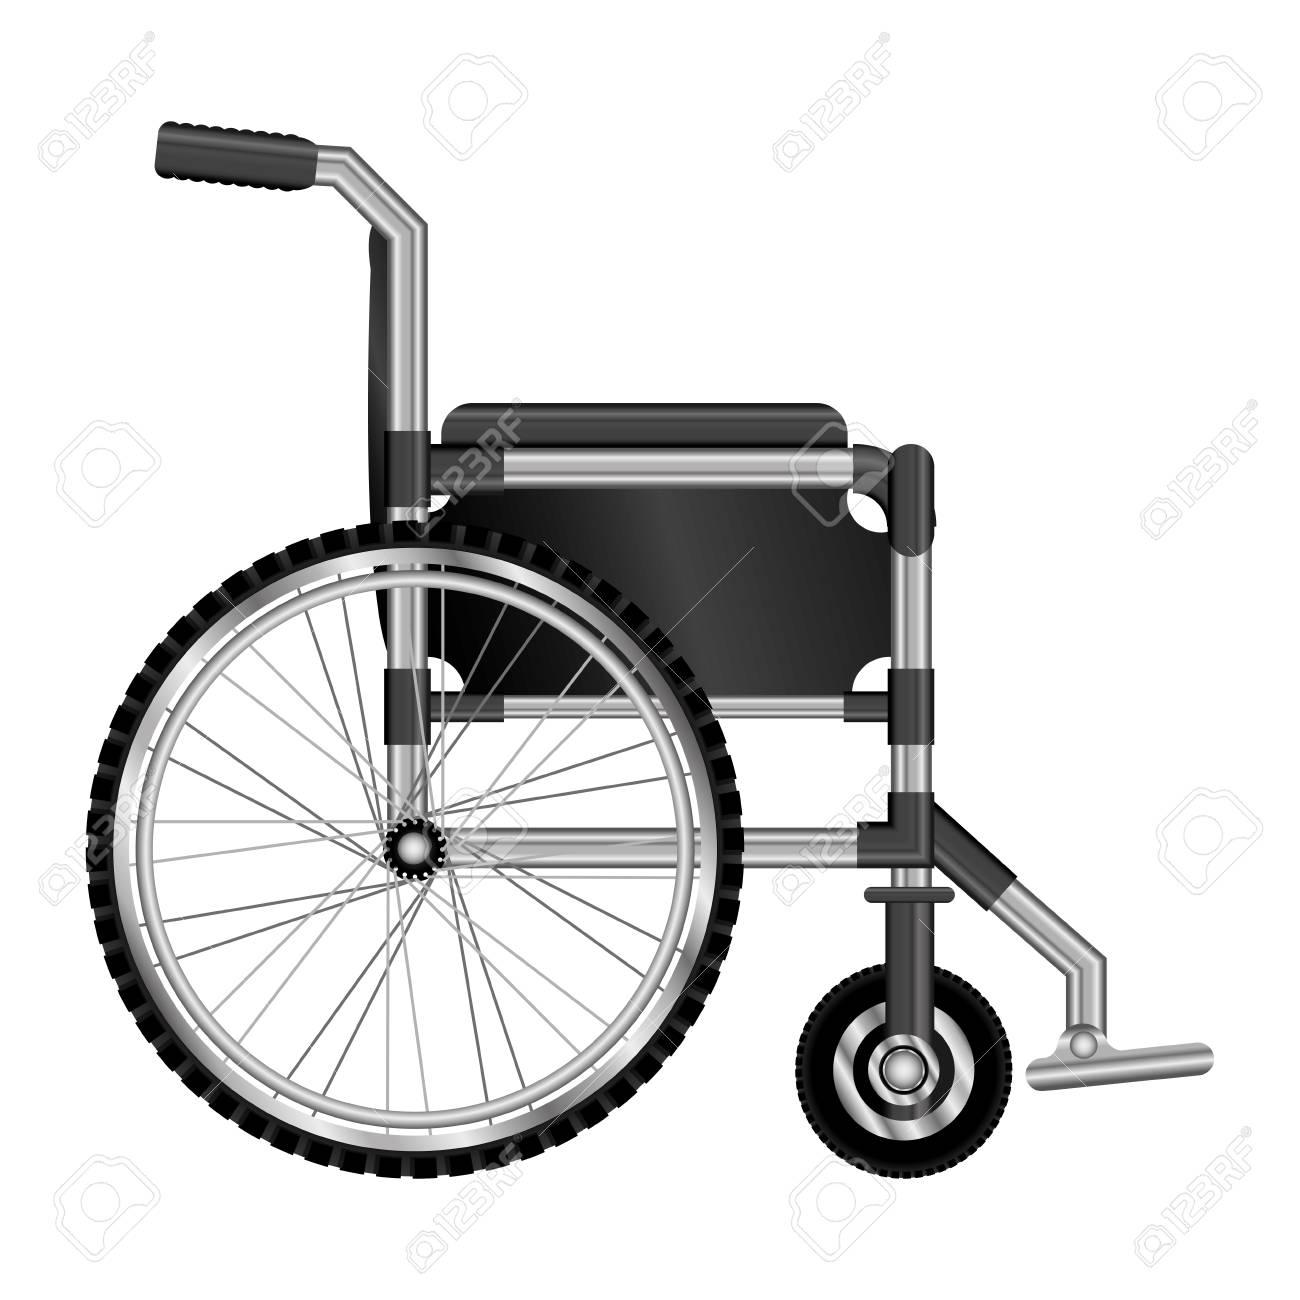 diseño de silla de ruedas